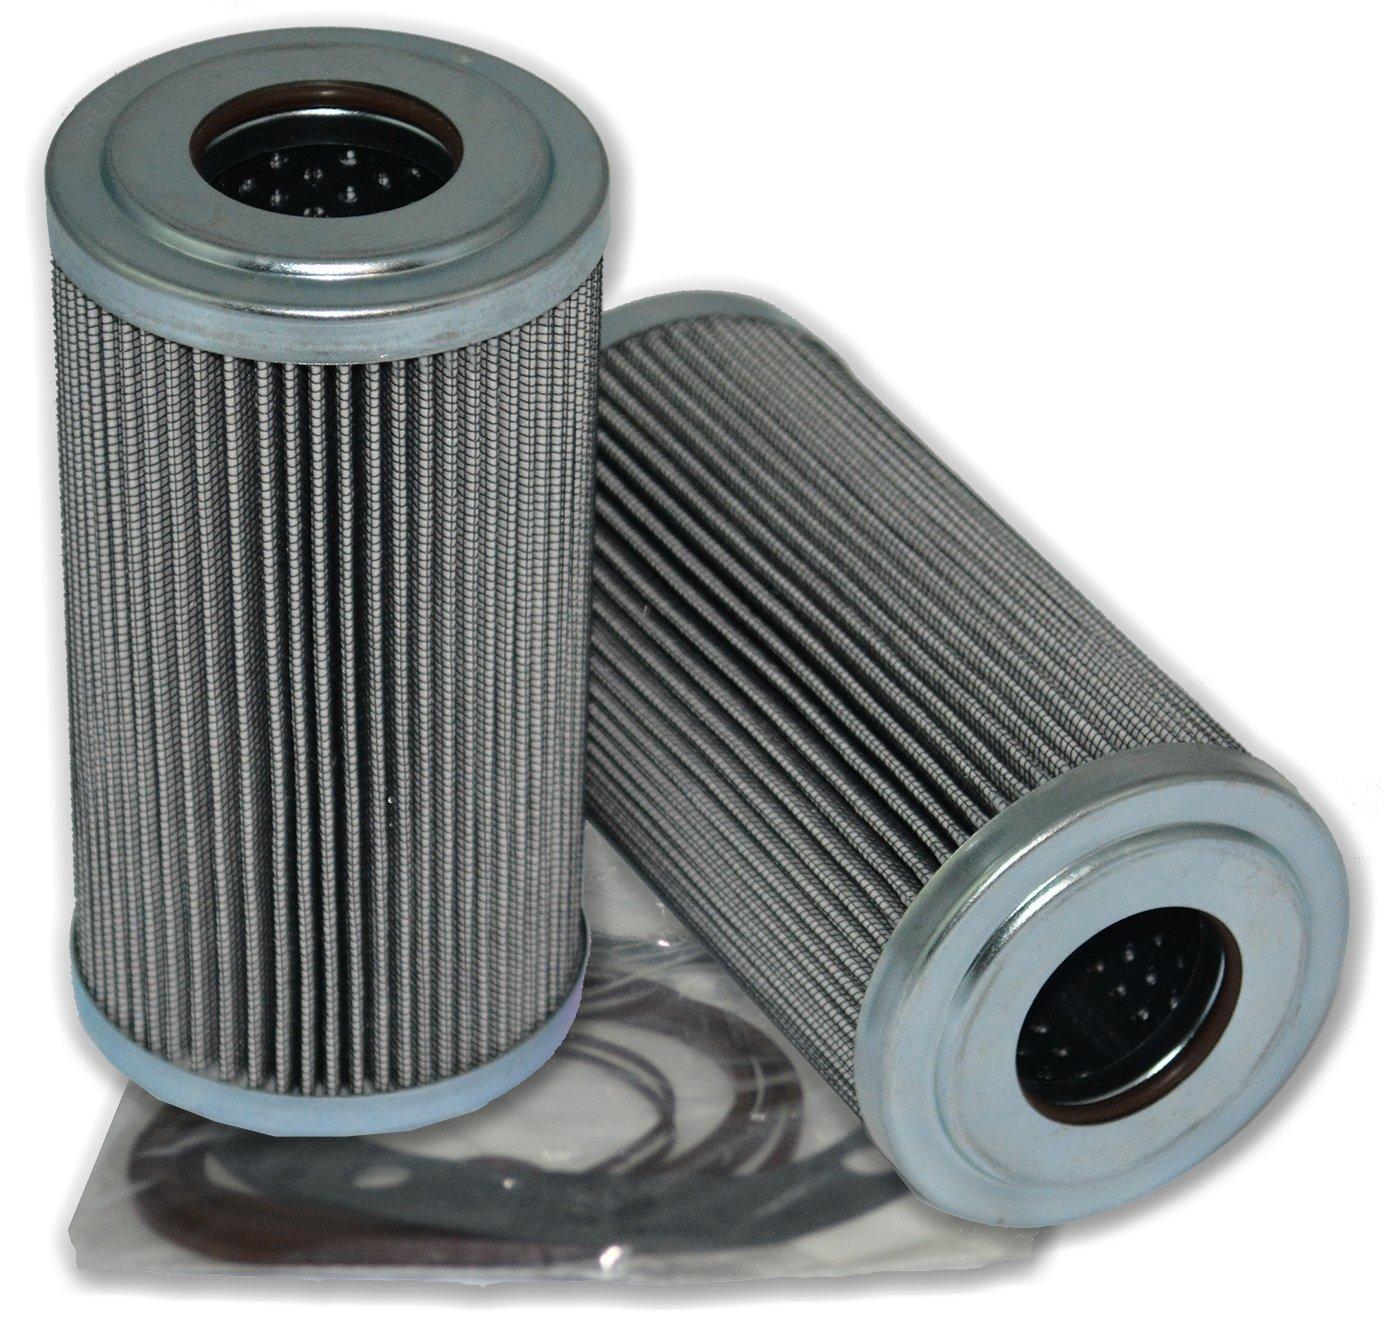 Allison High Capacity Filter Kit P N 29548988 29558118 Mercedes Benz Fuel On M2 29558329 Automotive